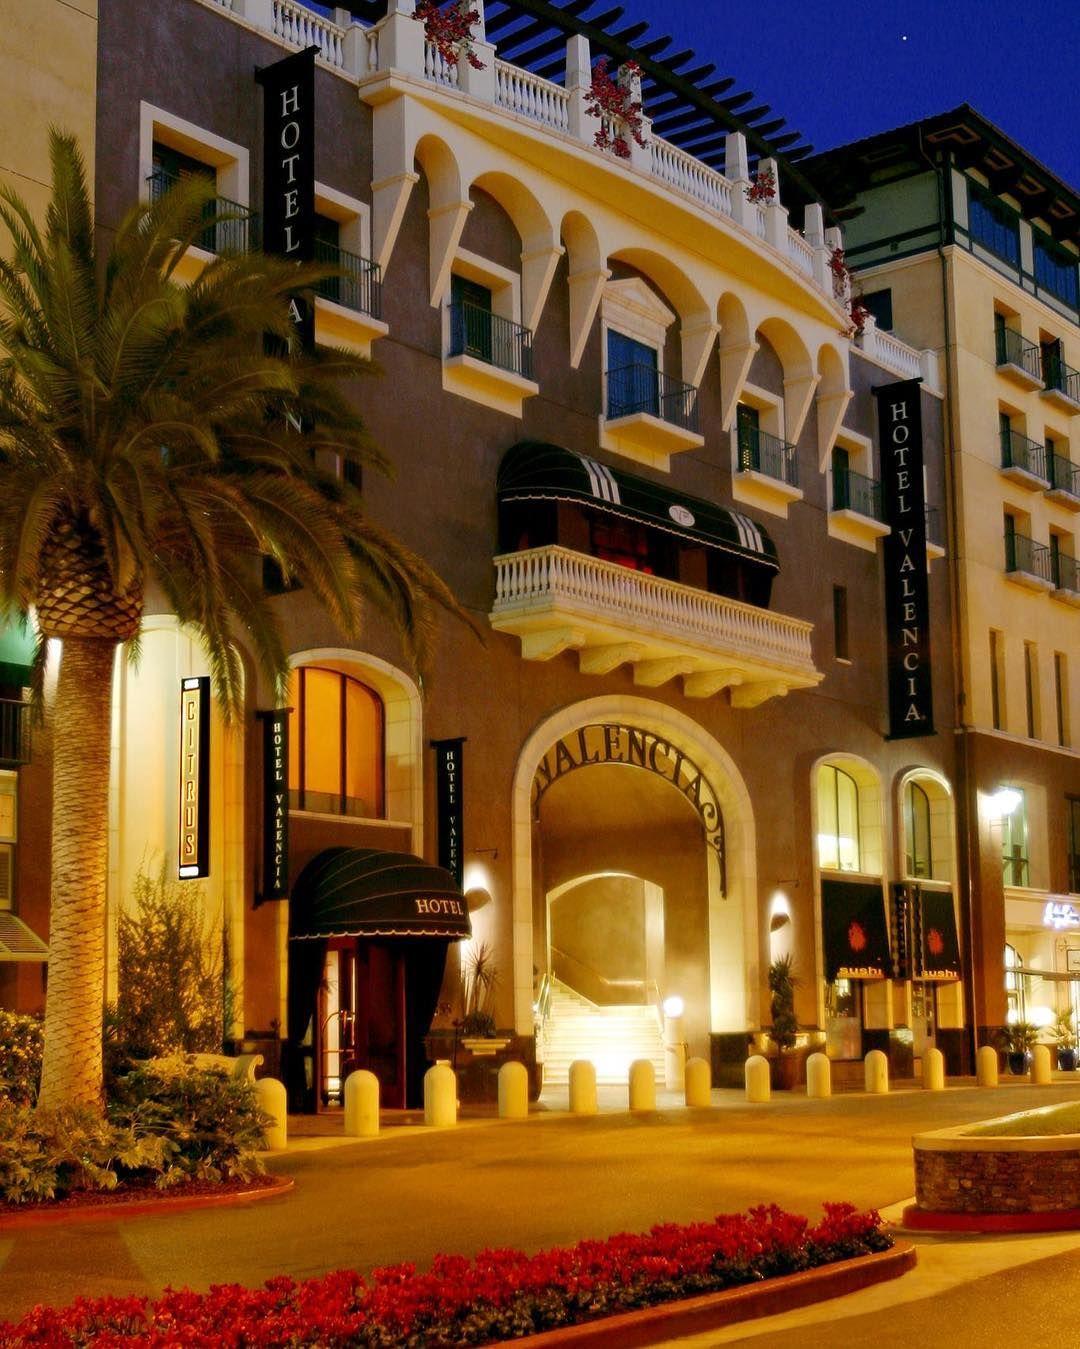 San Jose Ca Usa Hotel Hotel Valencia Santana Row Hotelvalenciasj